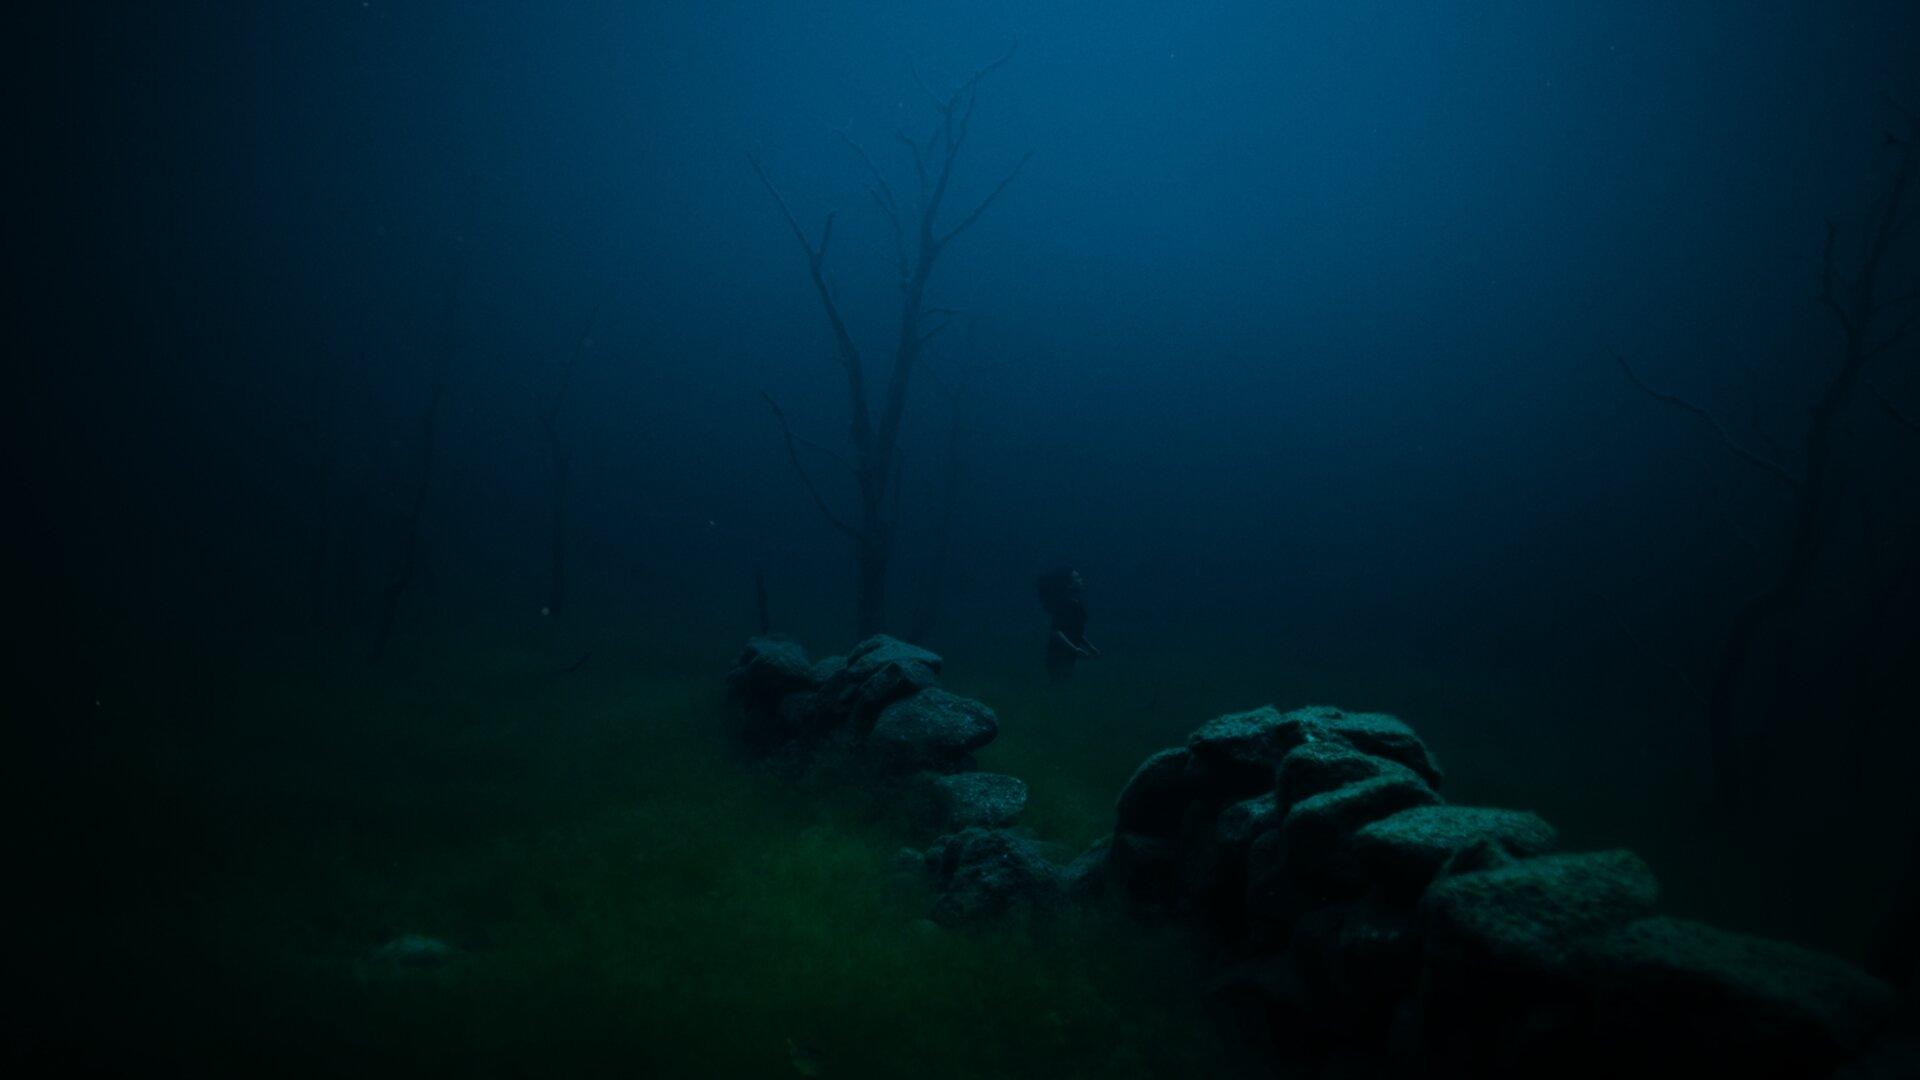 Rising Water_1.1.4.jpg